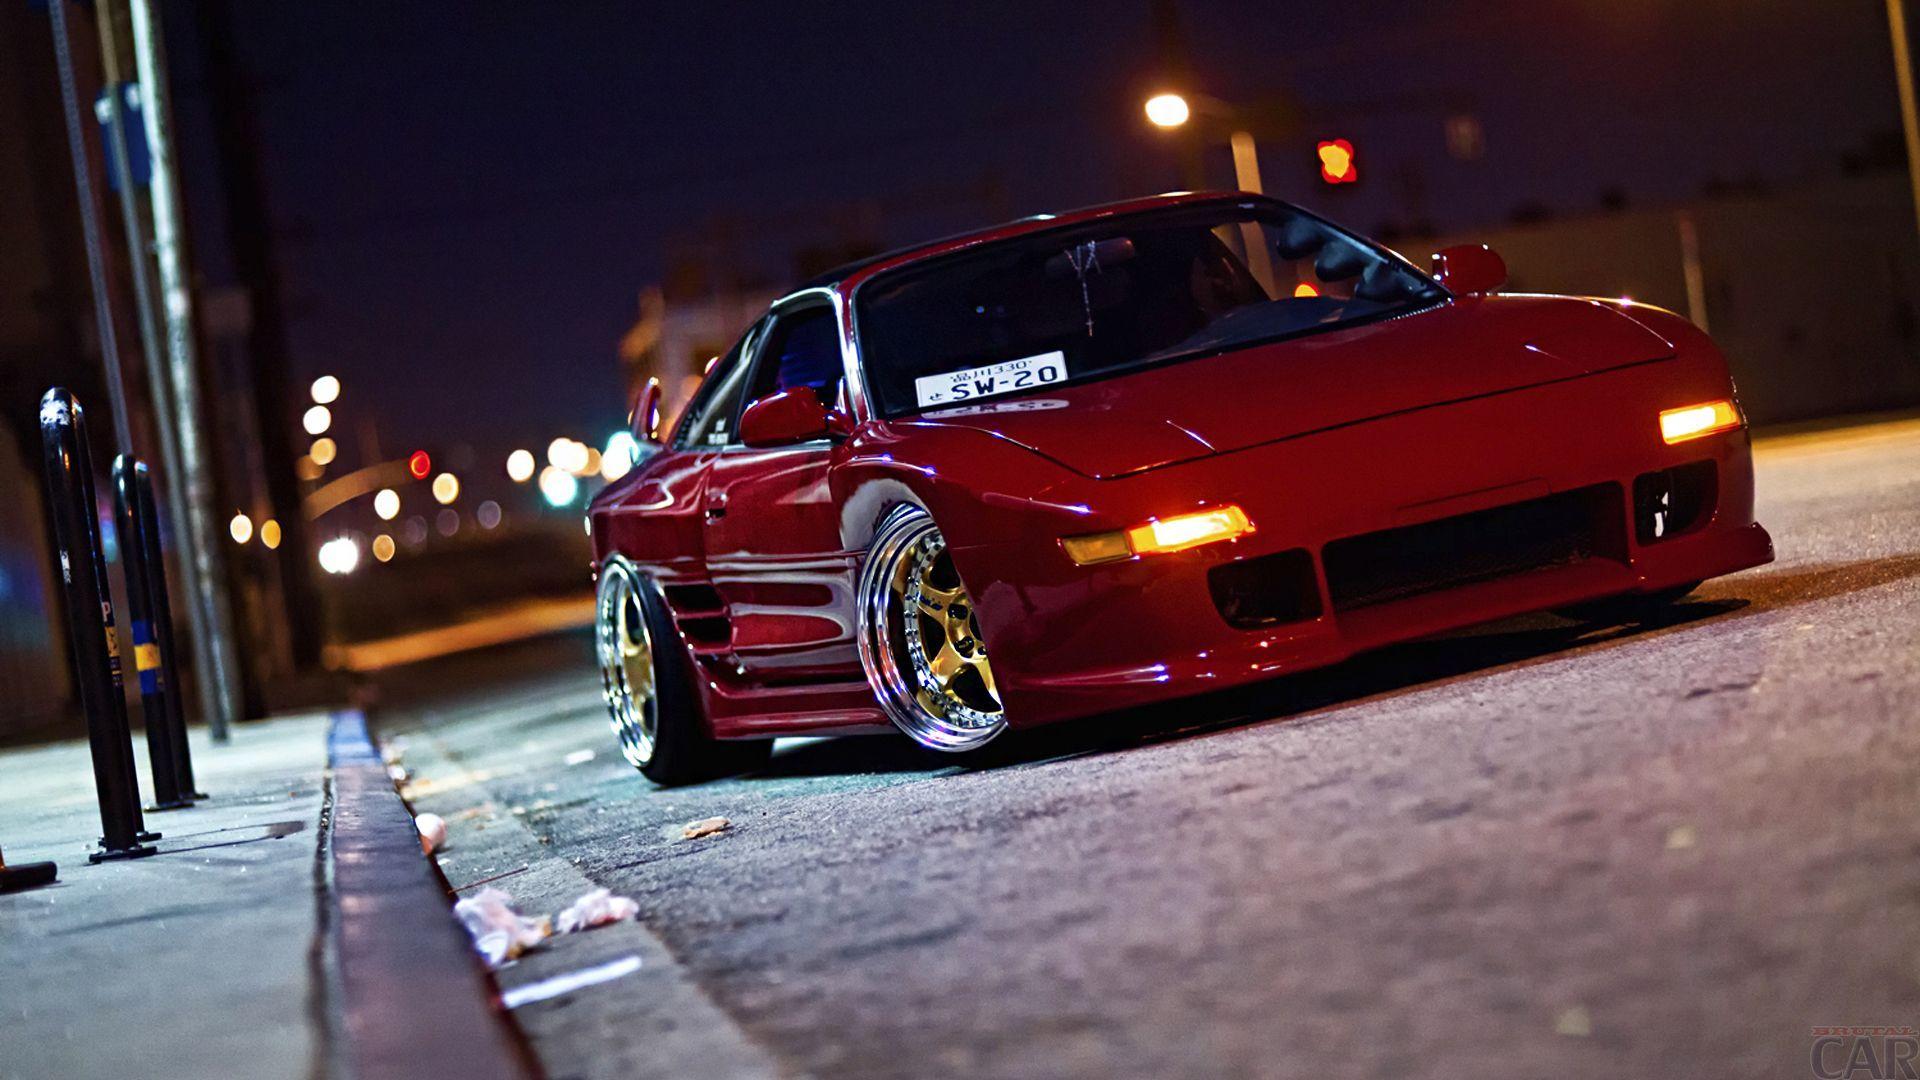 Toyota MR2 Turbo (SW20) Fast Cars Pinterest More